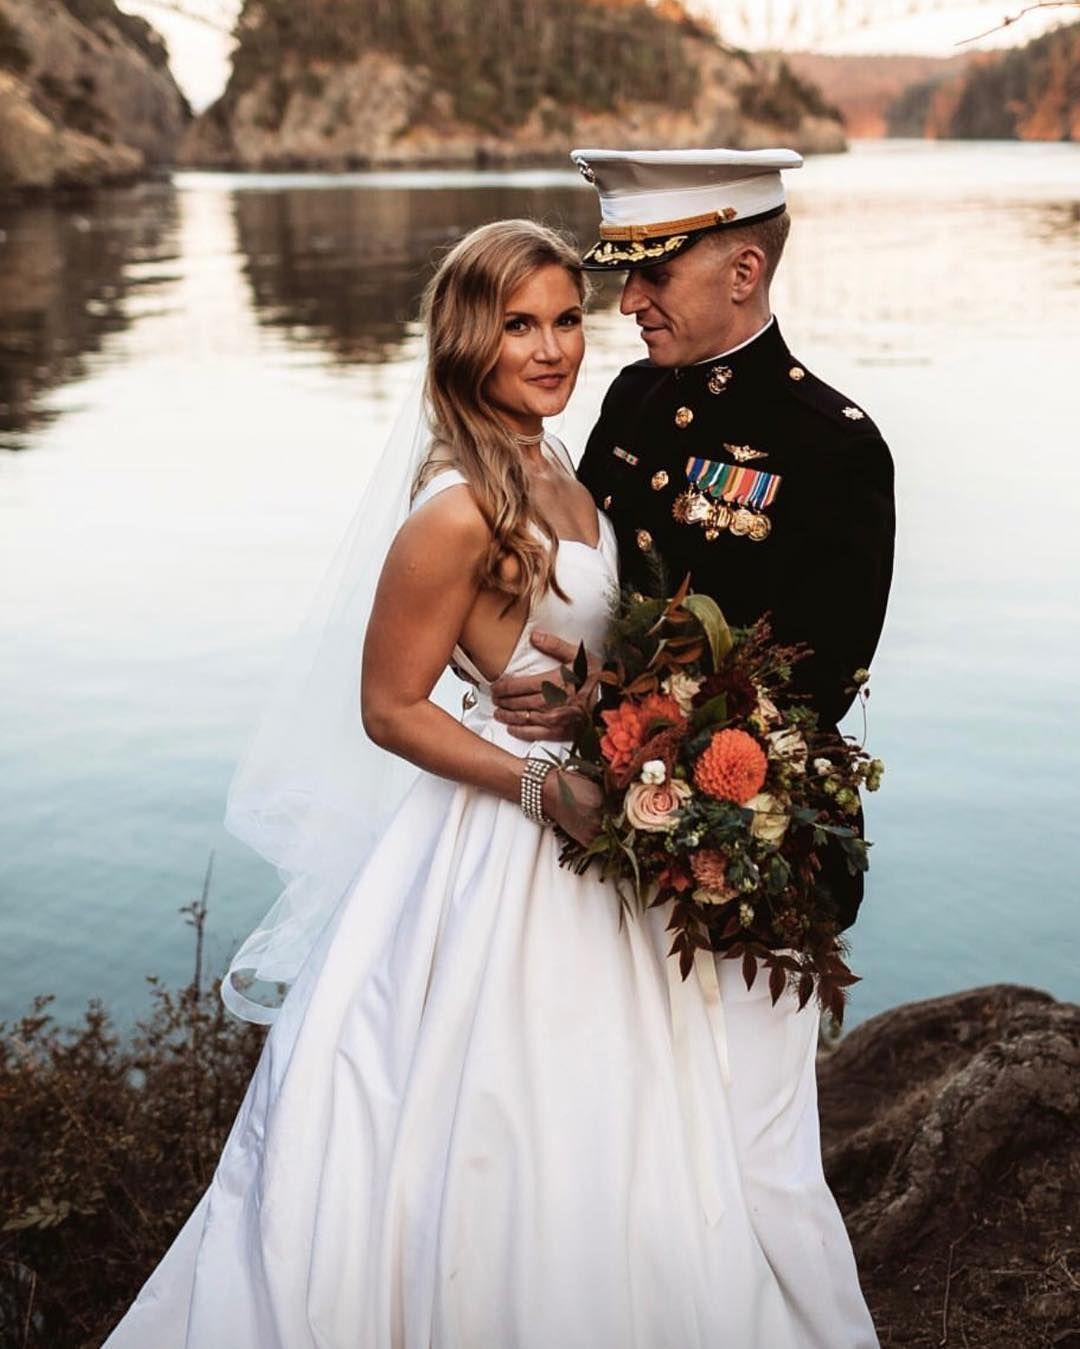 Wedding Hair Color Ideas: Deception Pass Elopement In Washington State